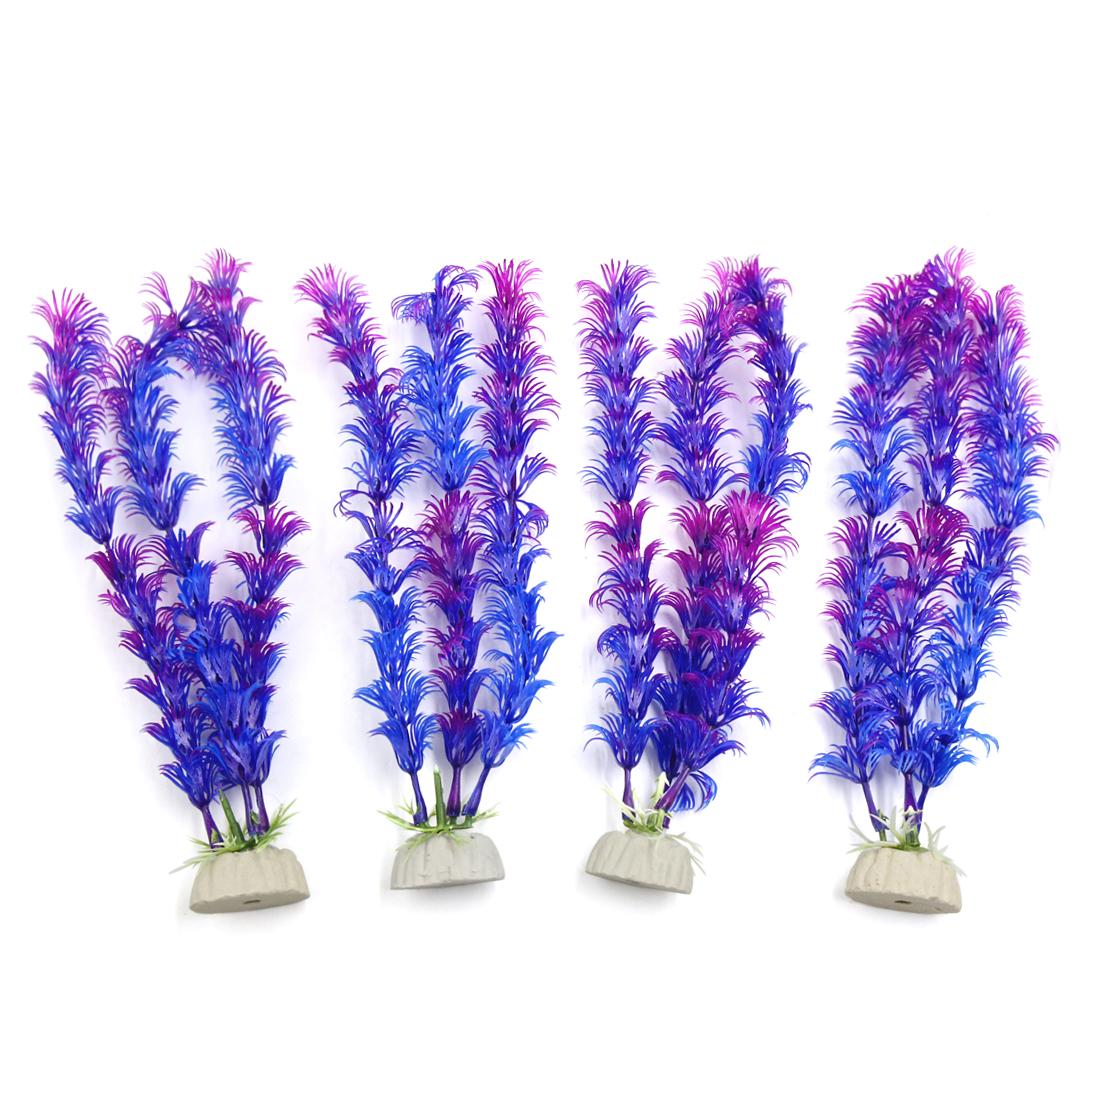 4pcs Purple Plastic Aquarium Plants Fish Tank Water Plant Decorative Ornament